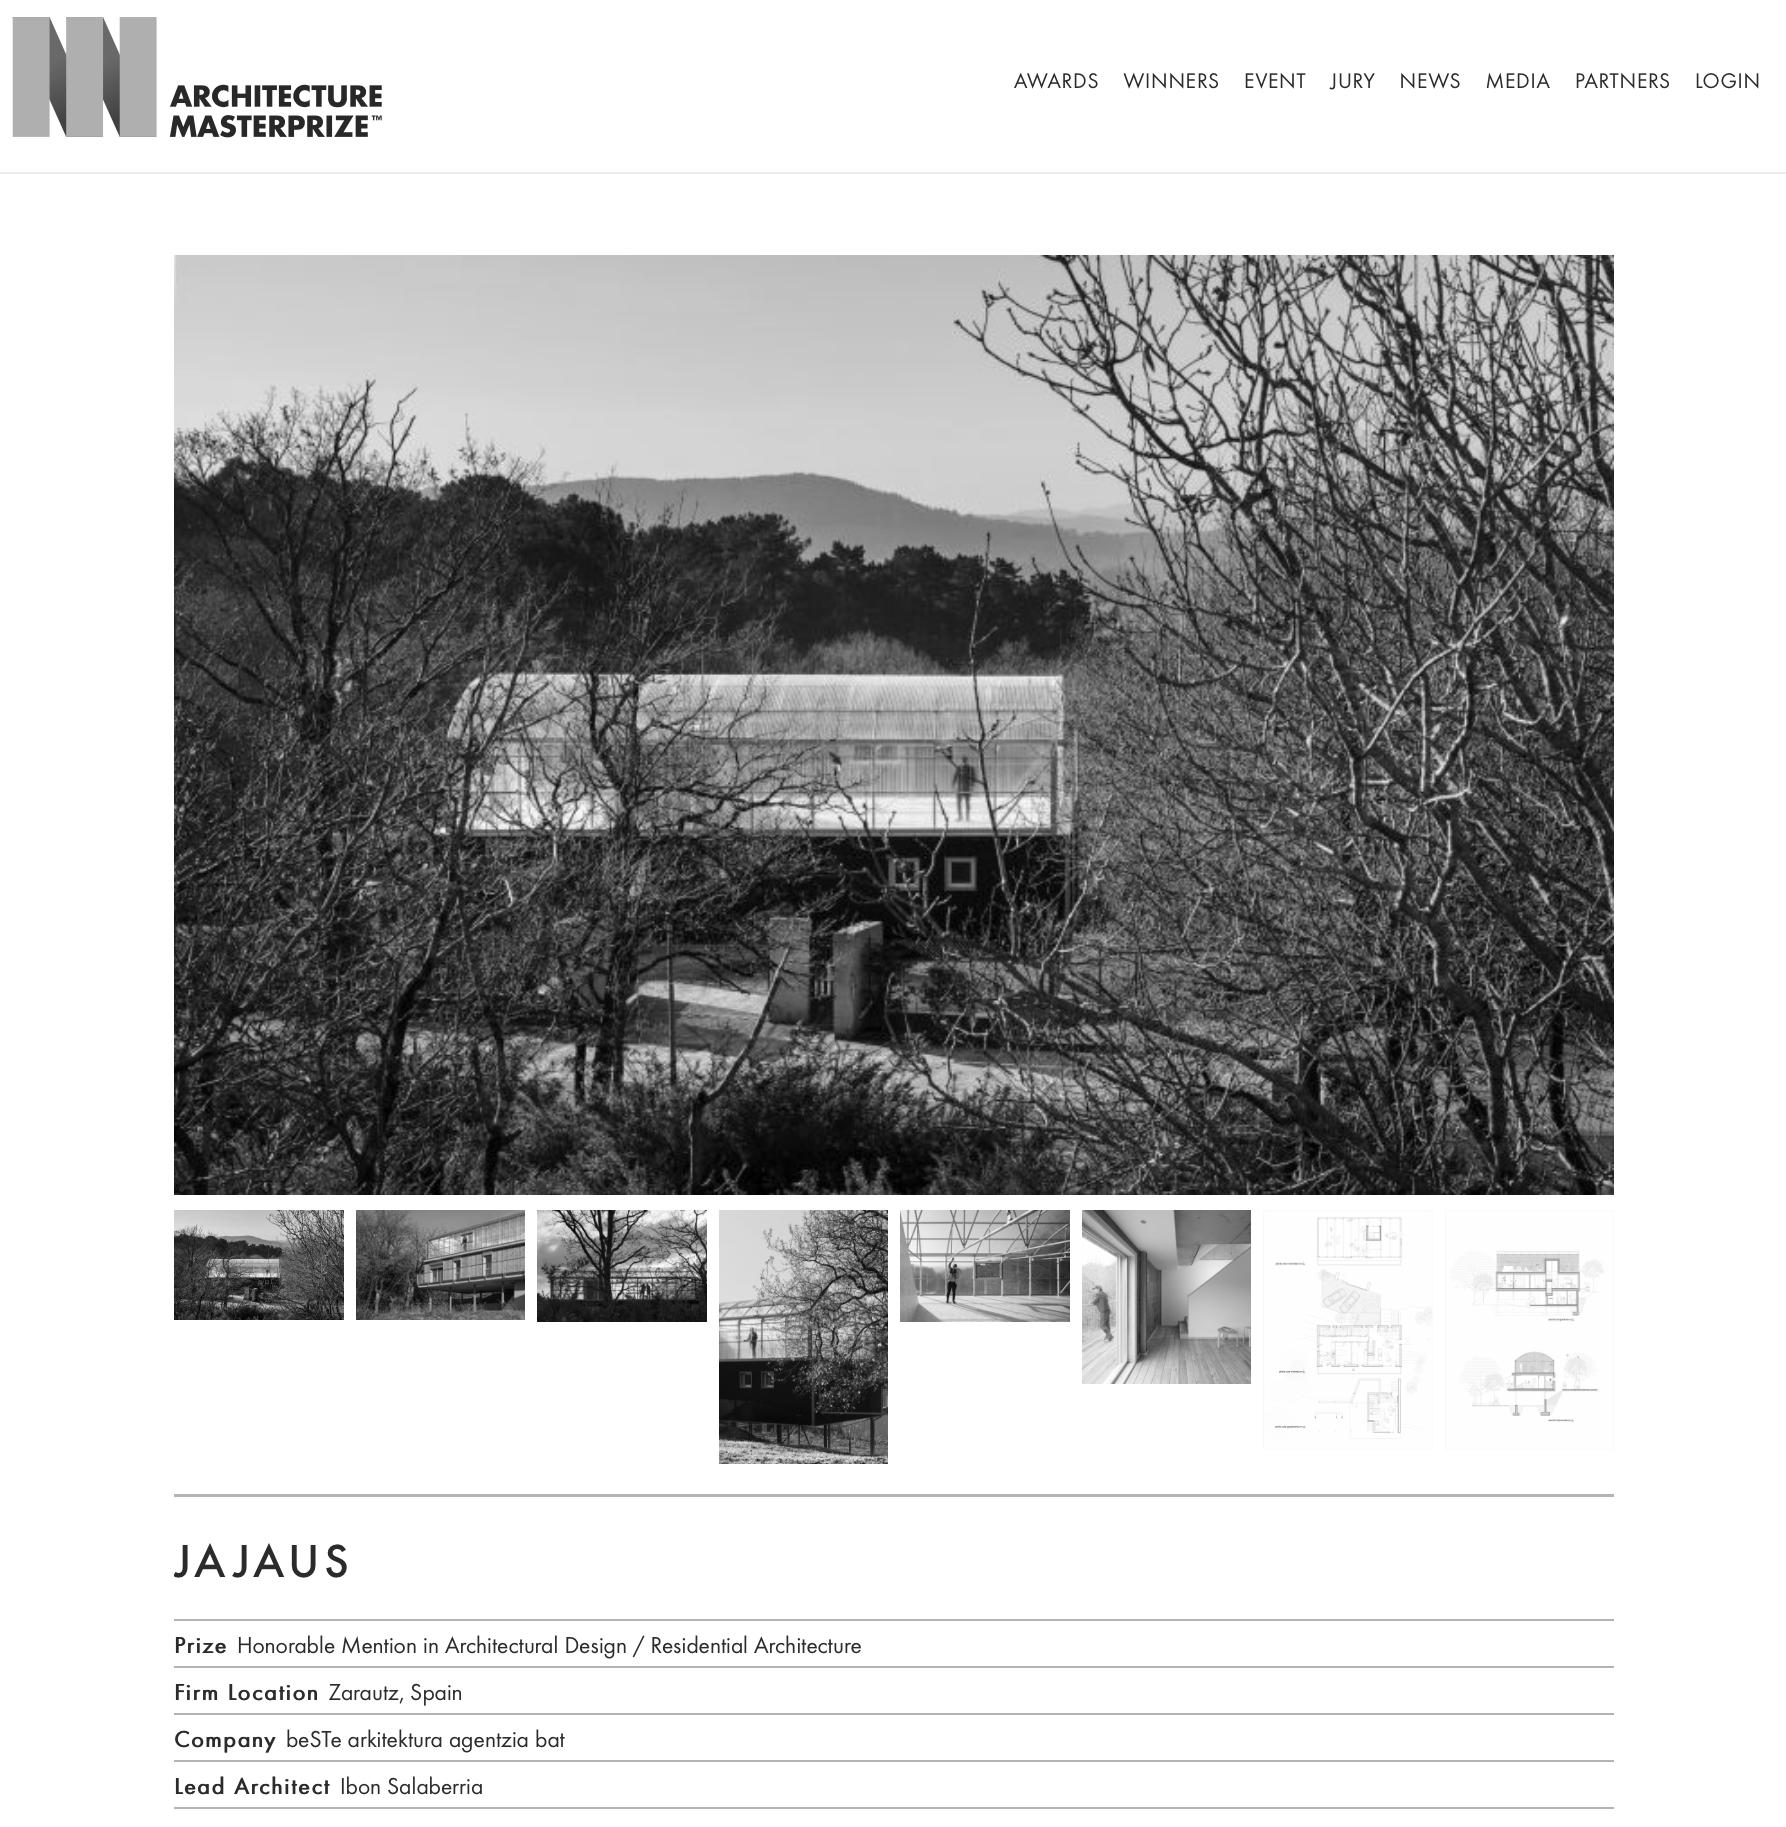 Jajaus_ArchitectureMasterprize